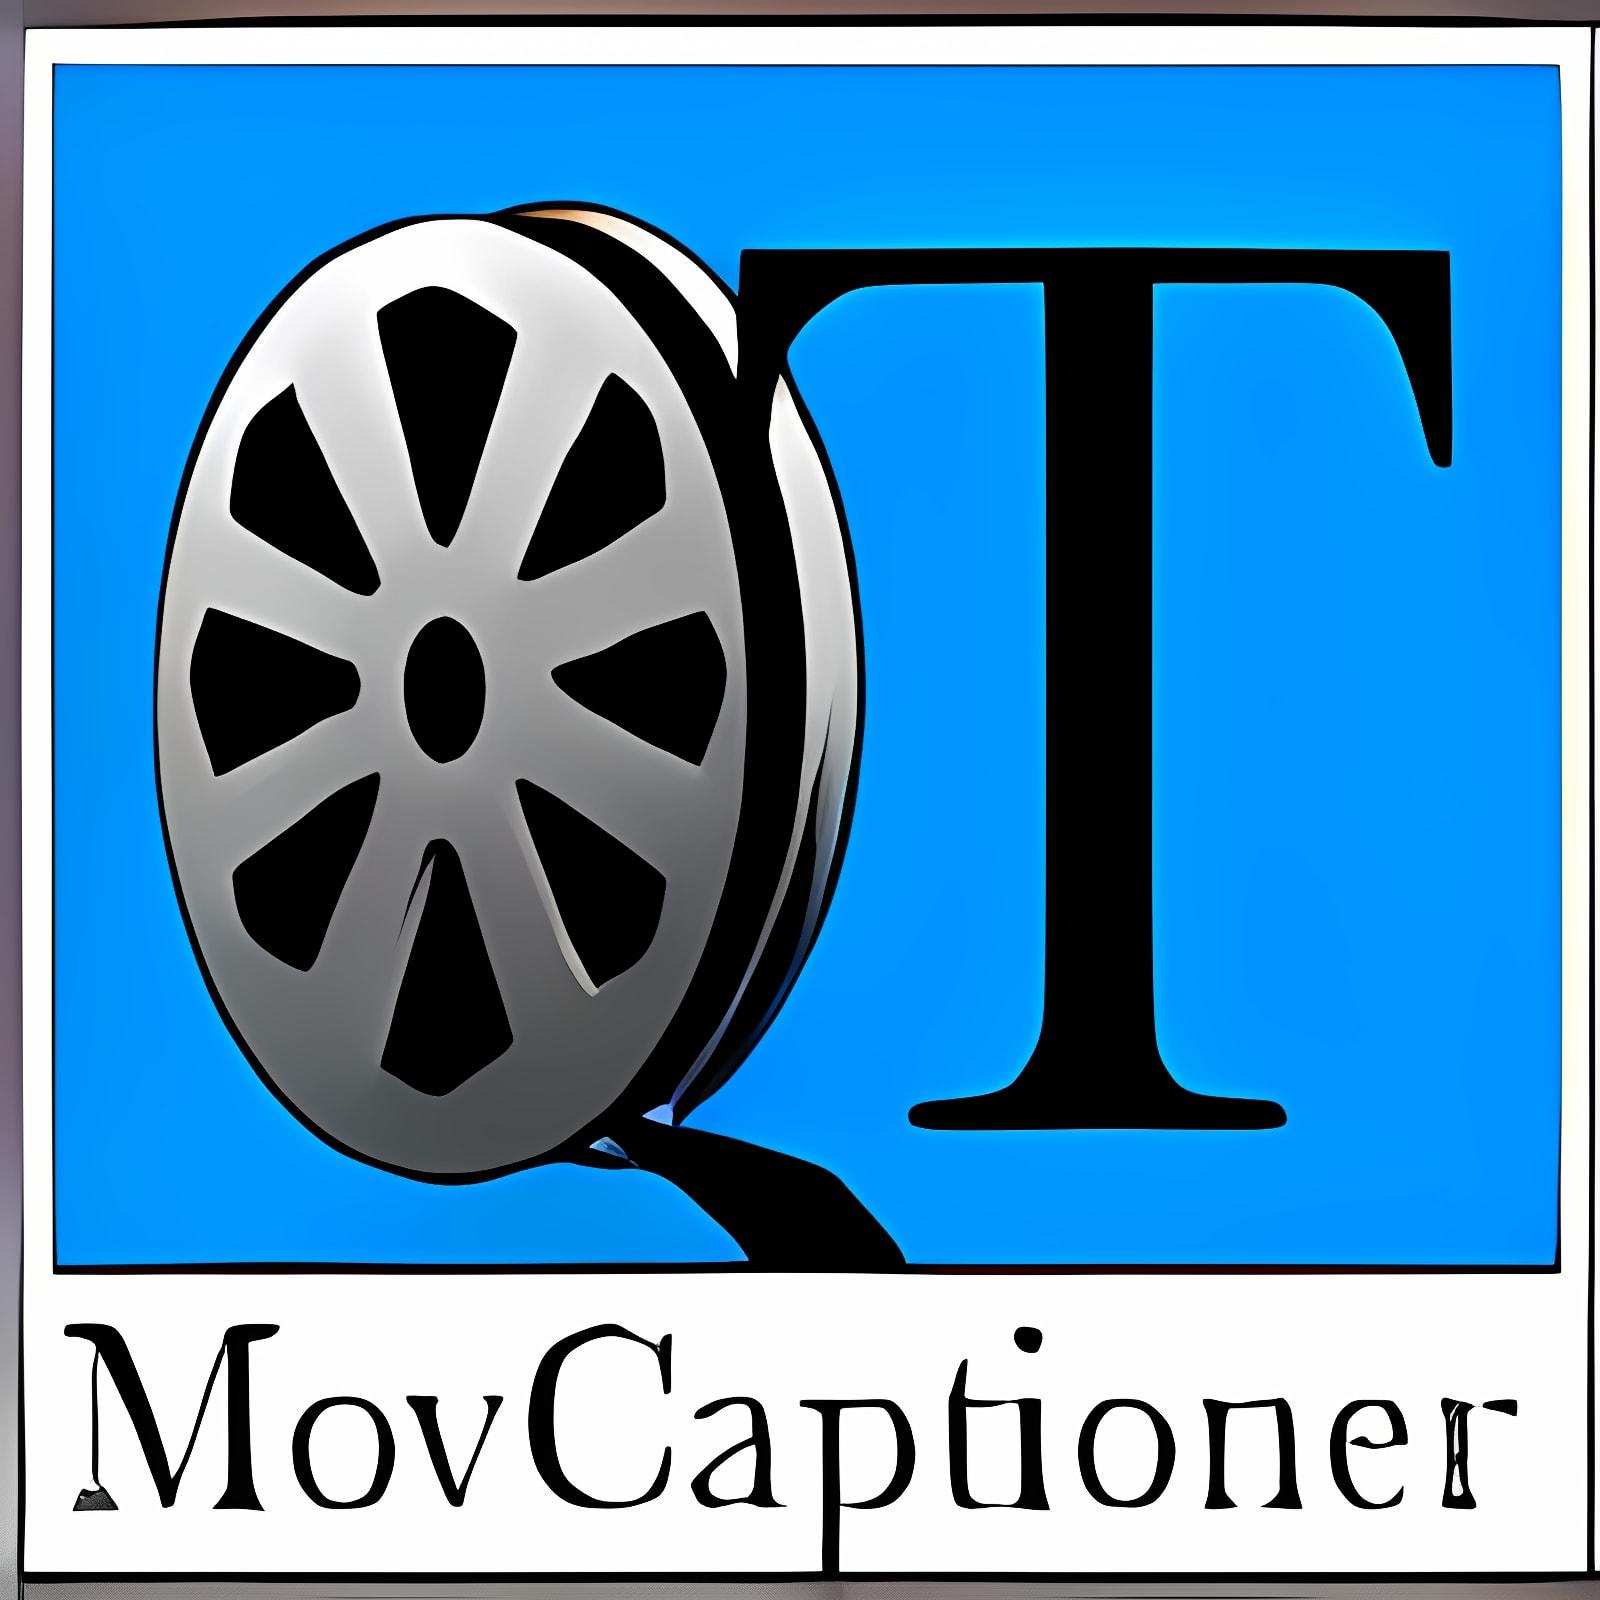 MovCaptioner